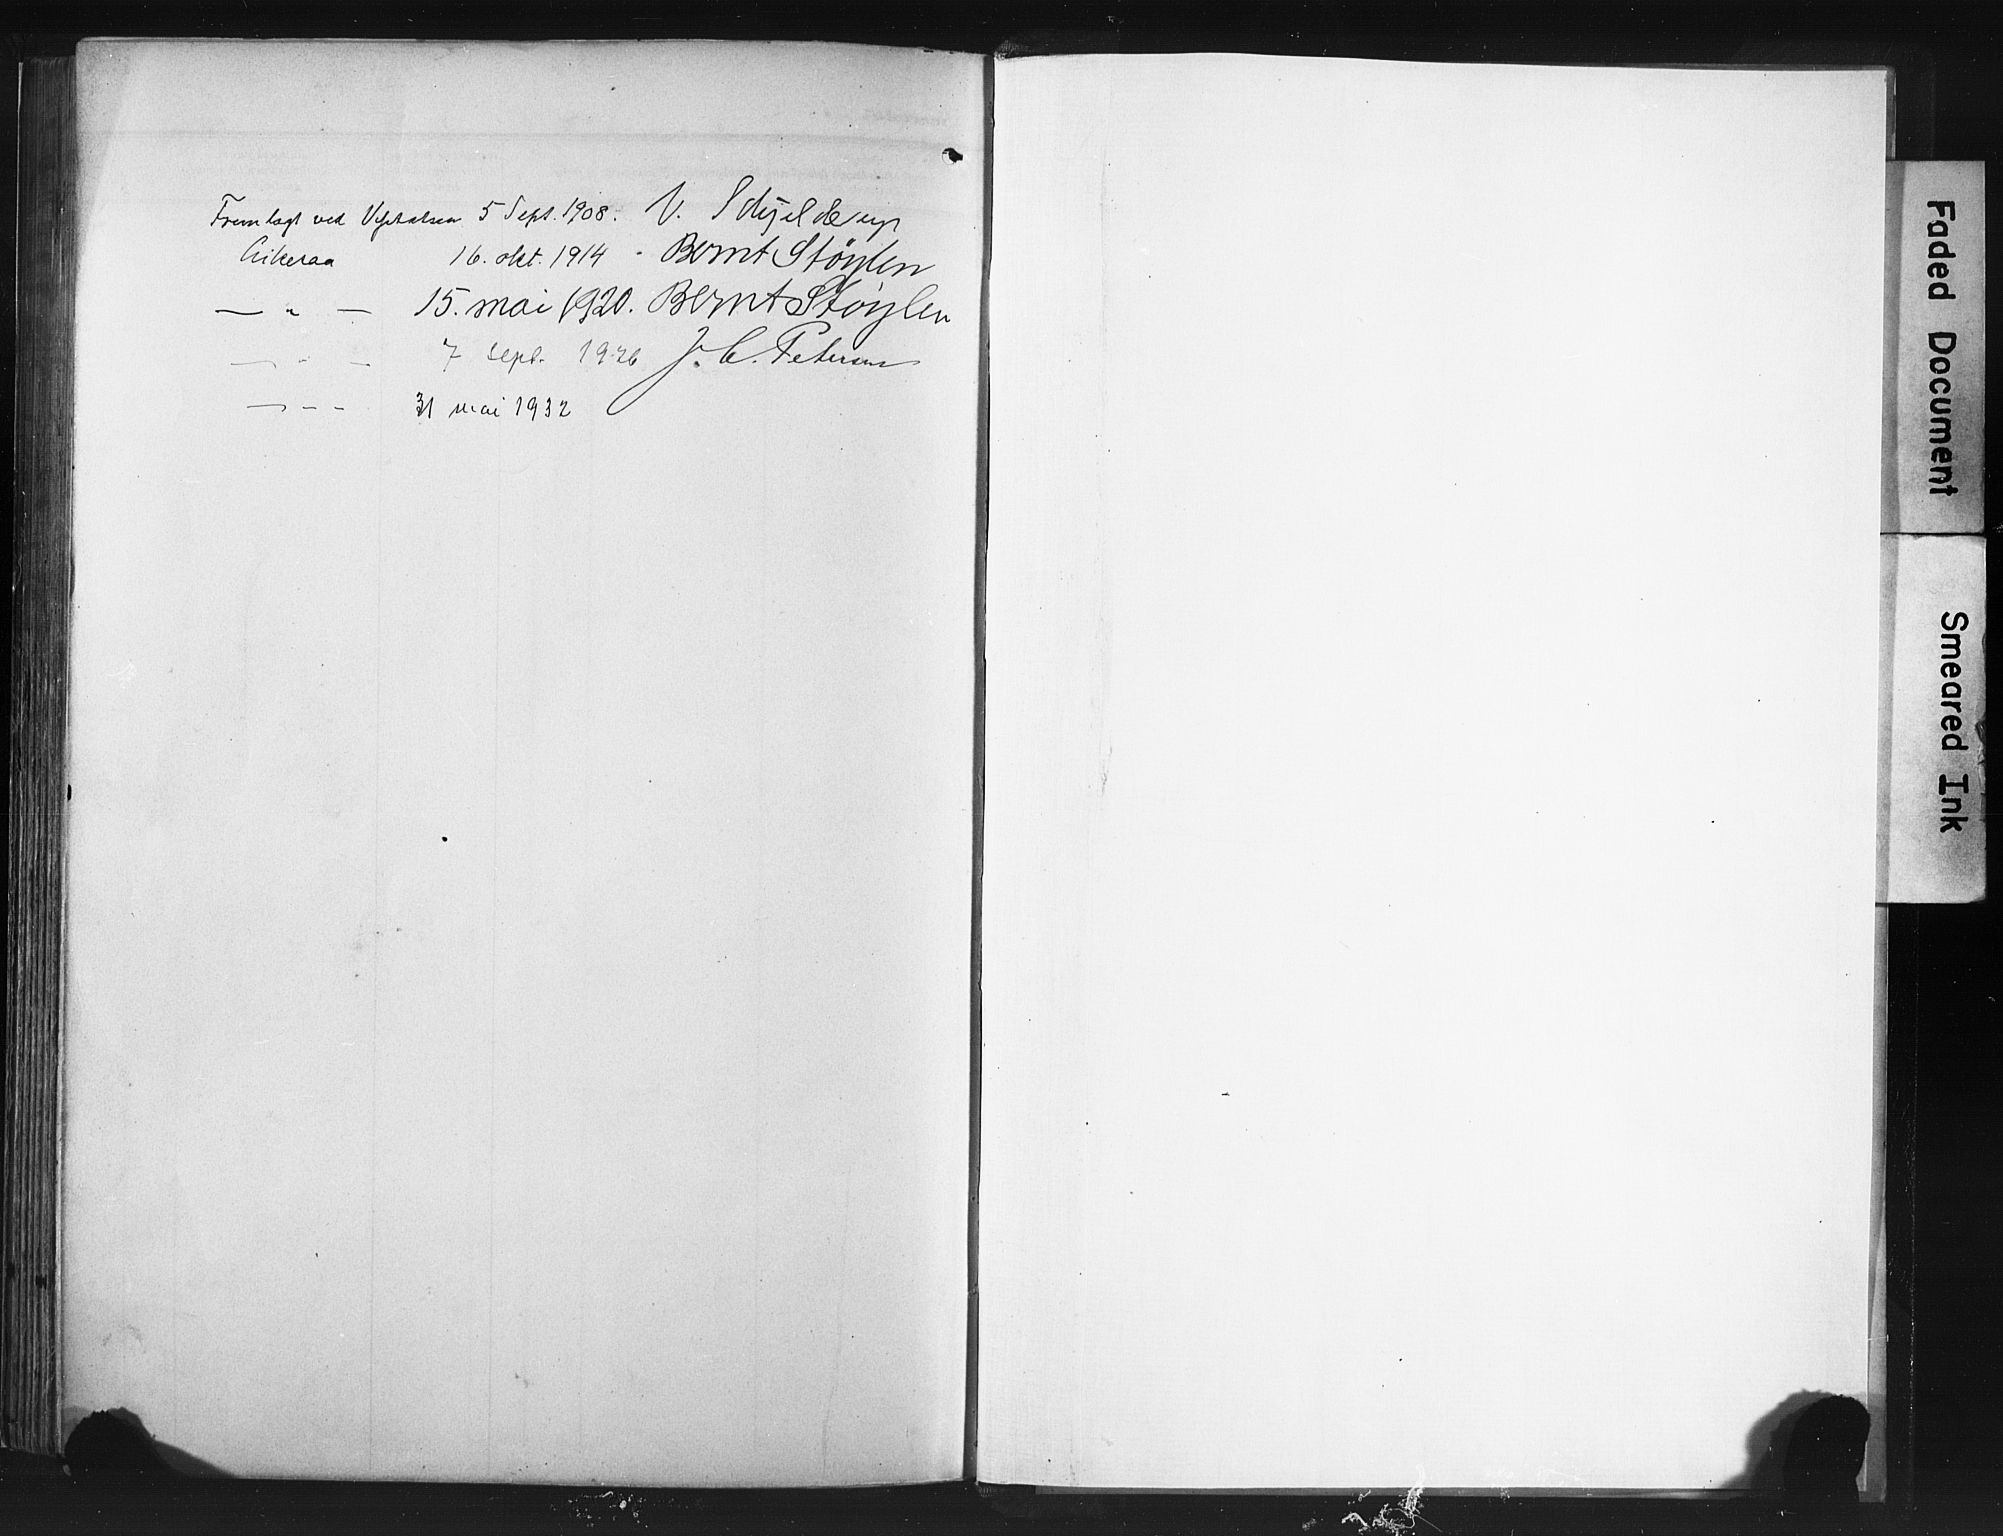 SAST, Hetland sokneprestkontor, 30/30BA/L0013: Ministerialbok nr. A 13, 1904-1918